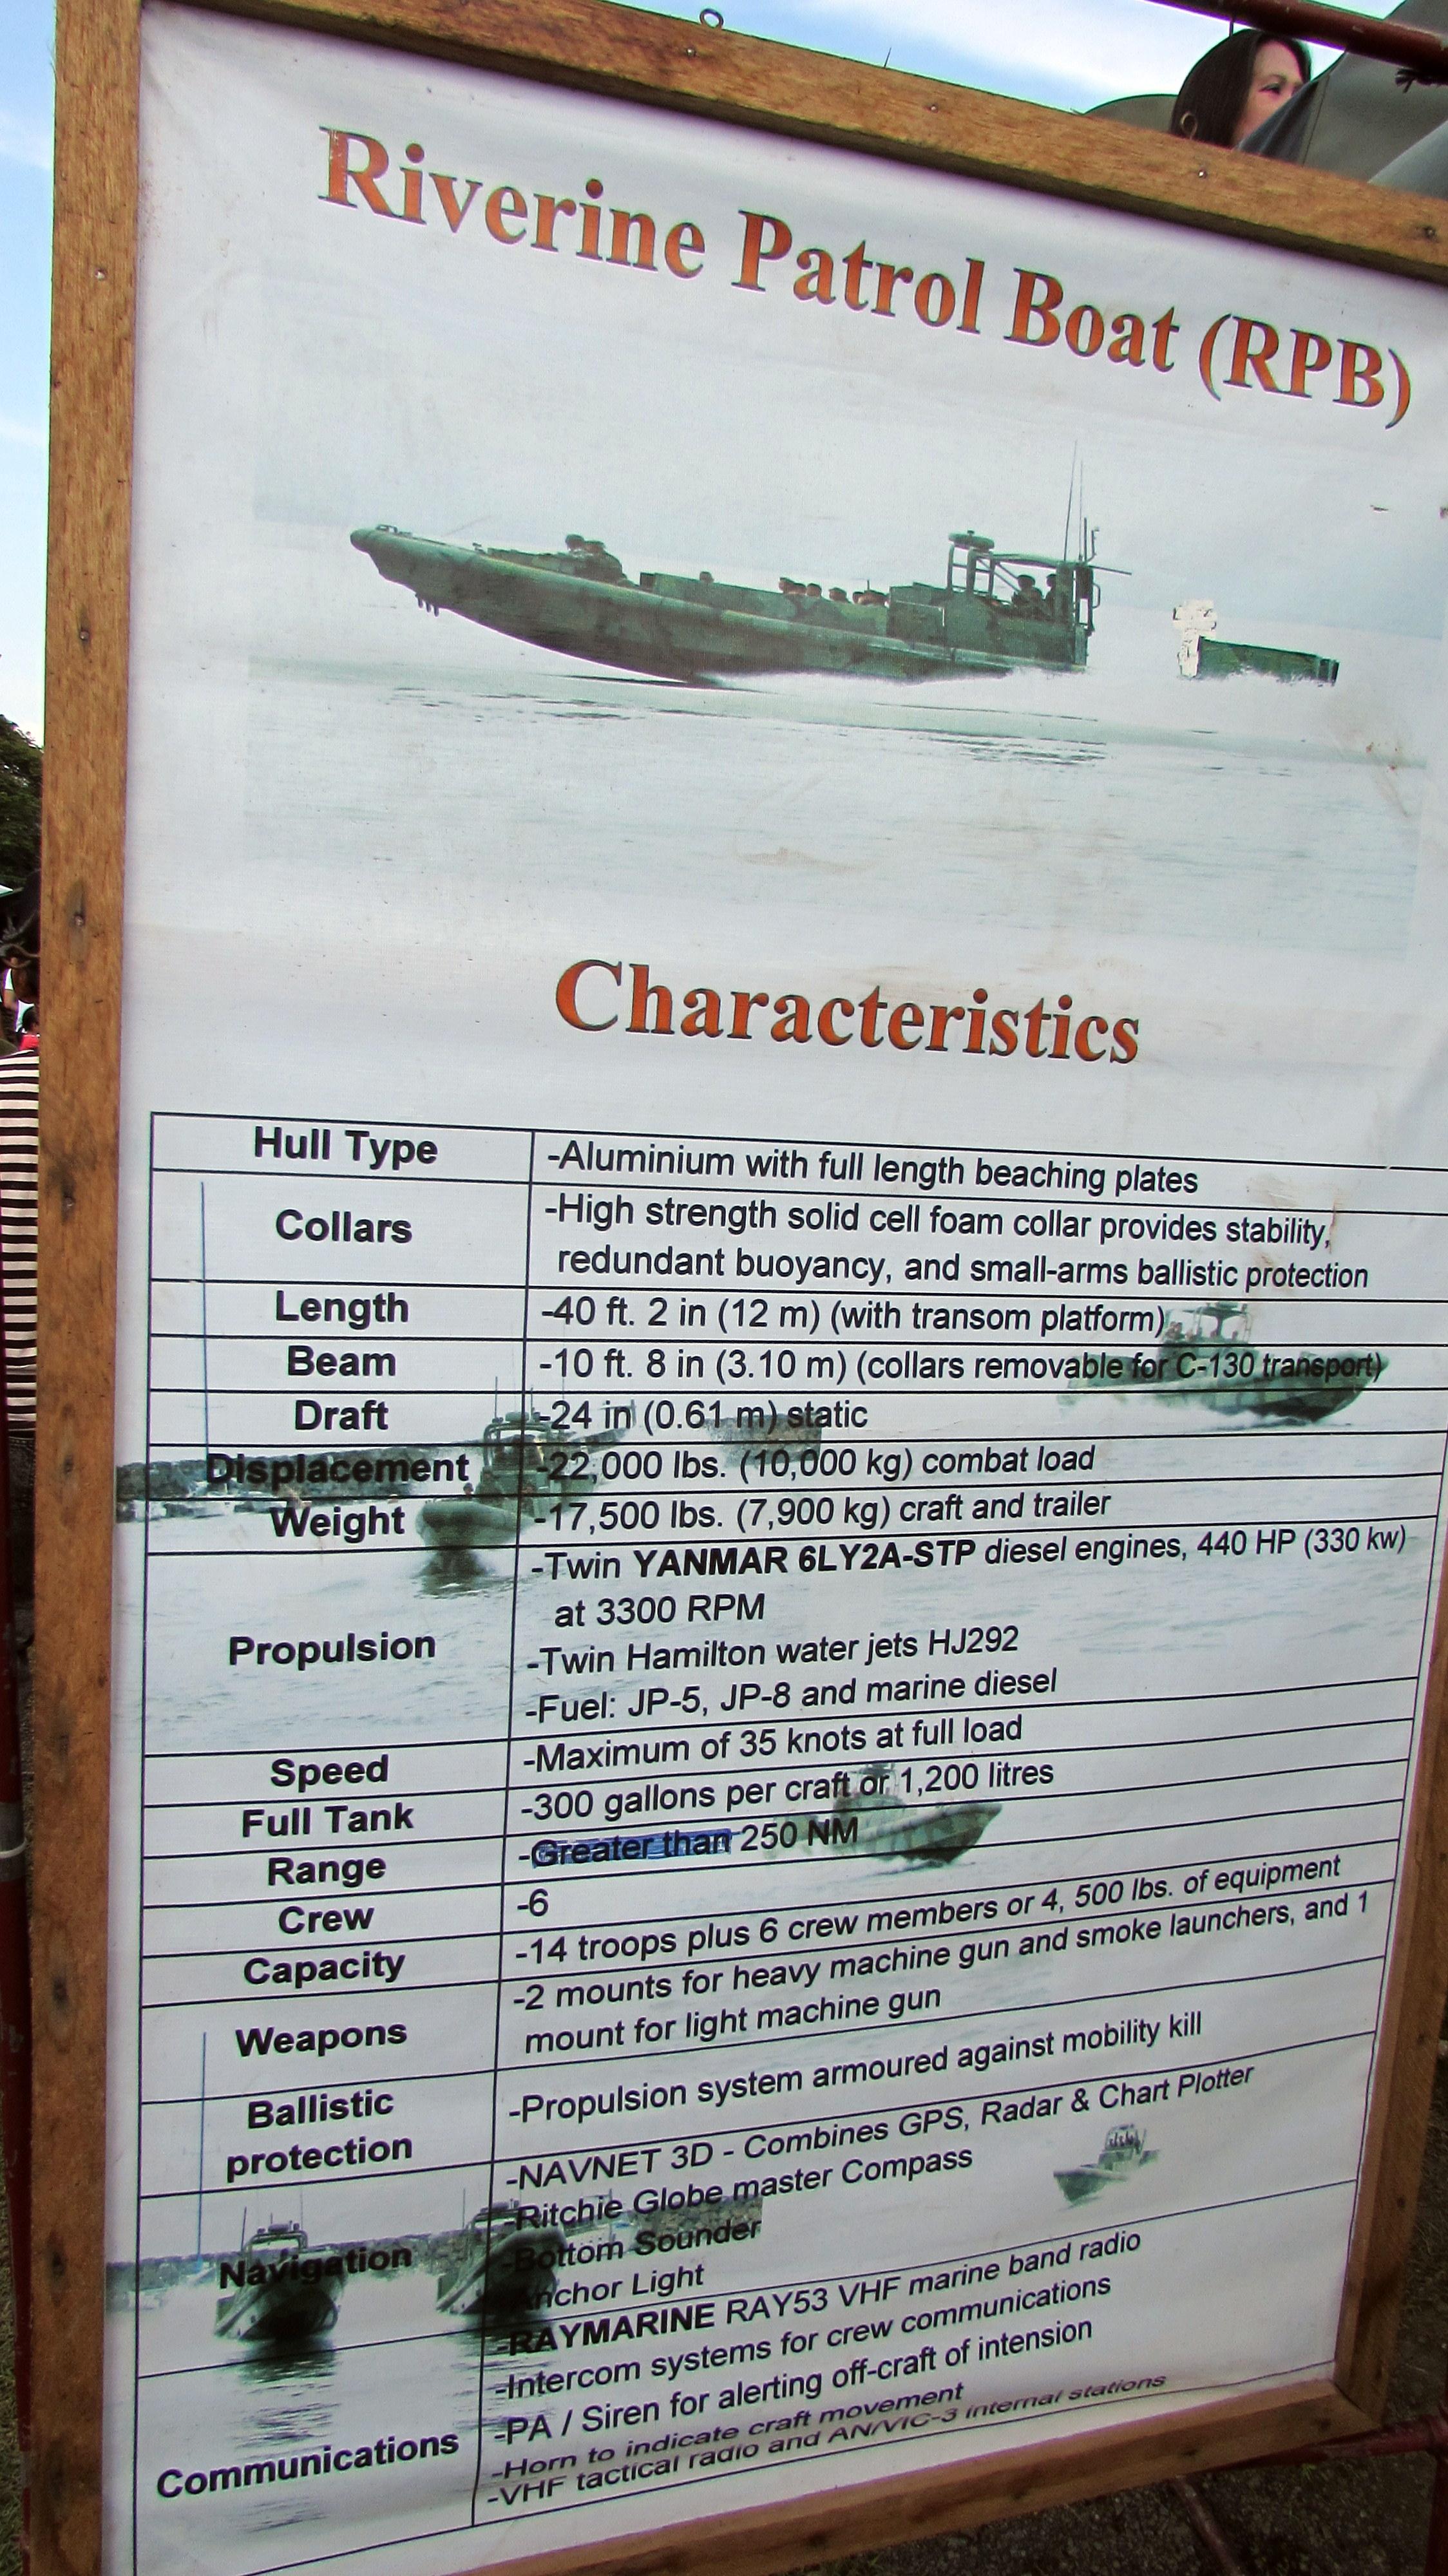 Fileriverine patrol boat descriptiong wikimedia commons fileriverine patrol boat descriptiong geenschuldenfo Image collections